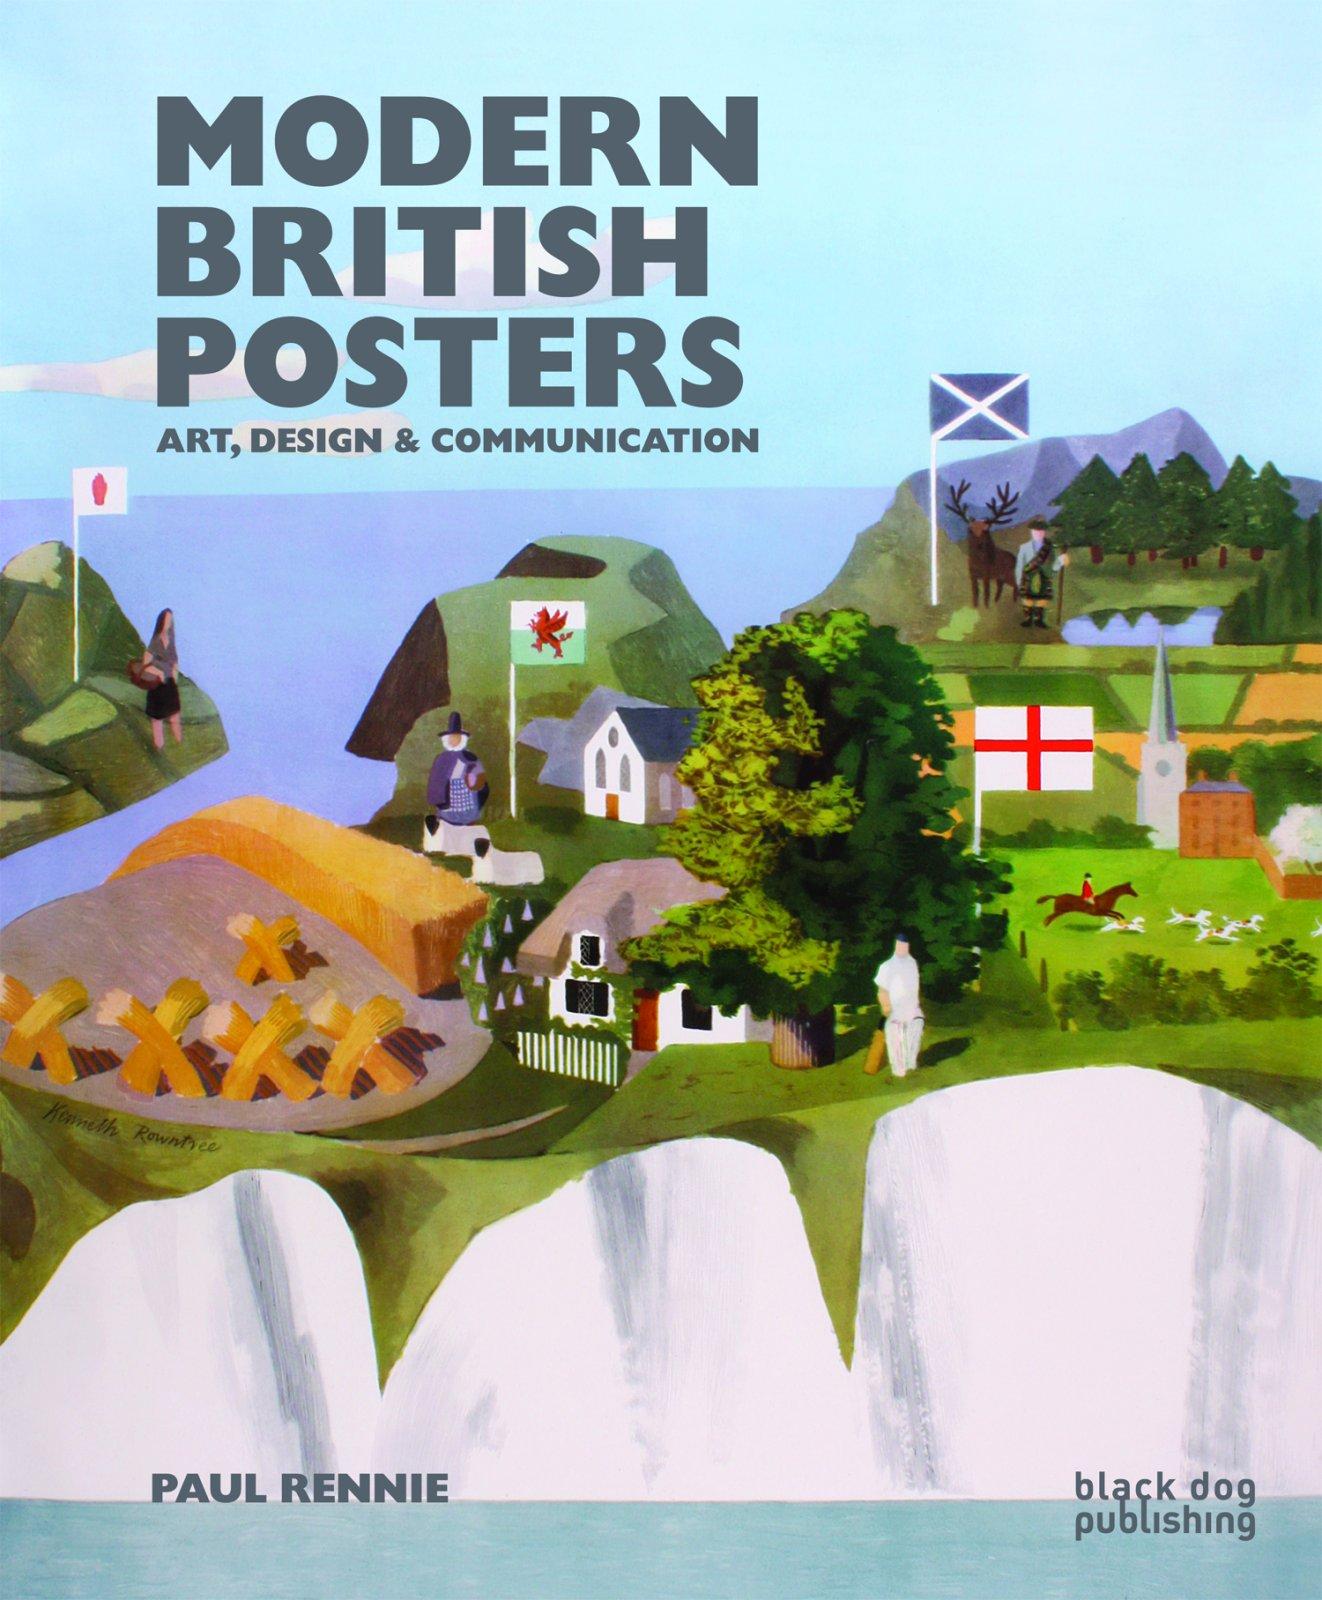 Poster design landscape - Modern British Posters Art Design Communication Paul Rennie 9781906155971 Amazon Com Books